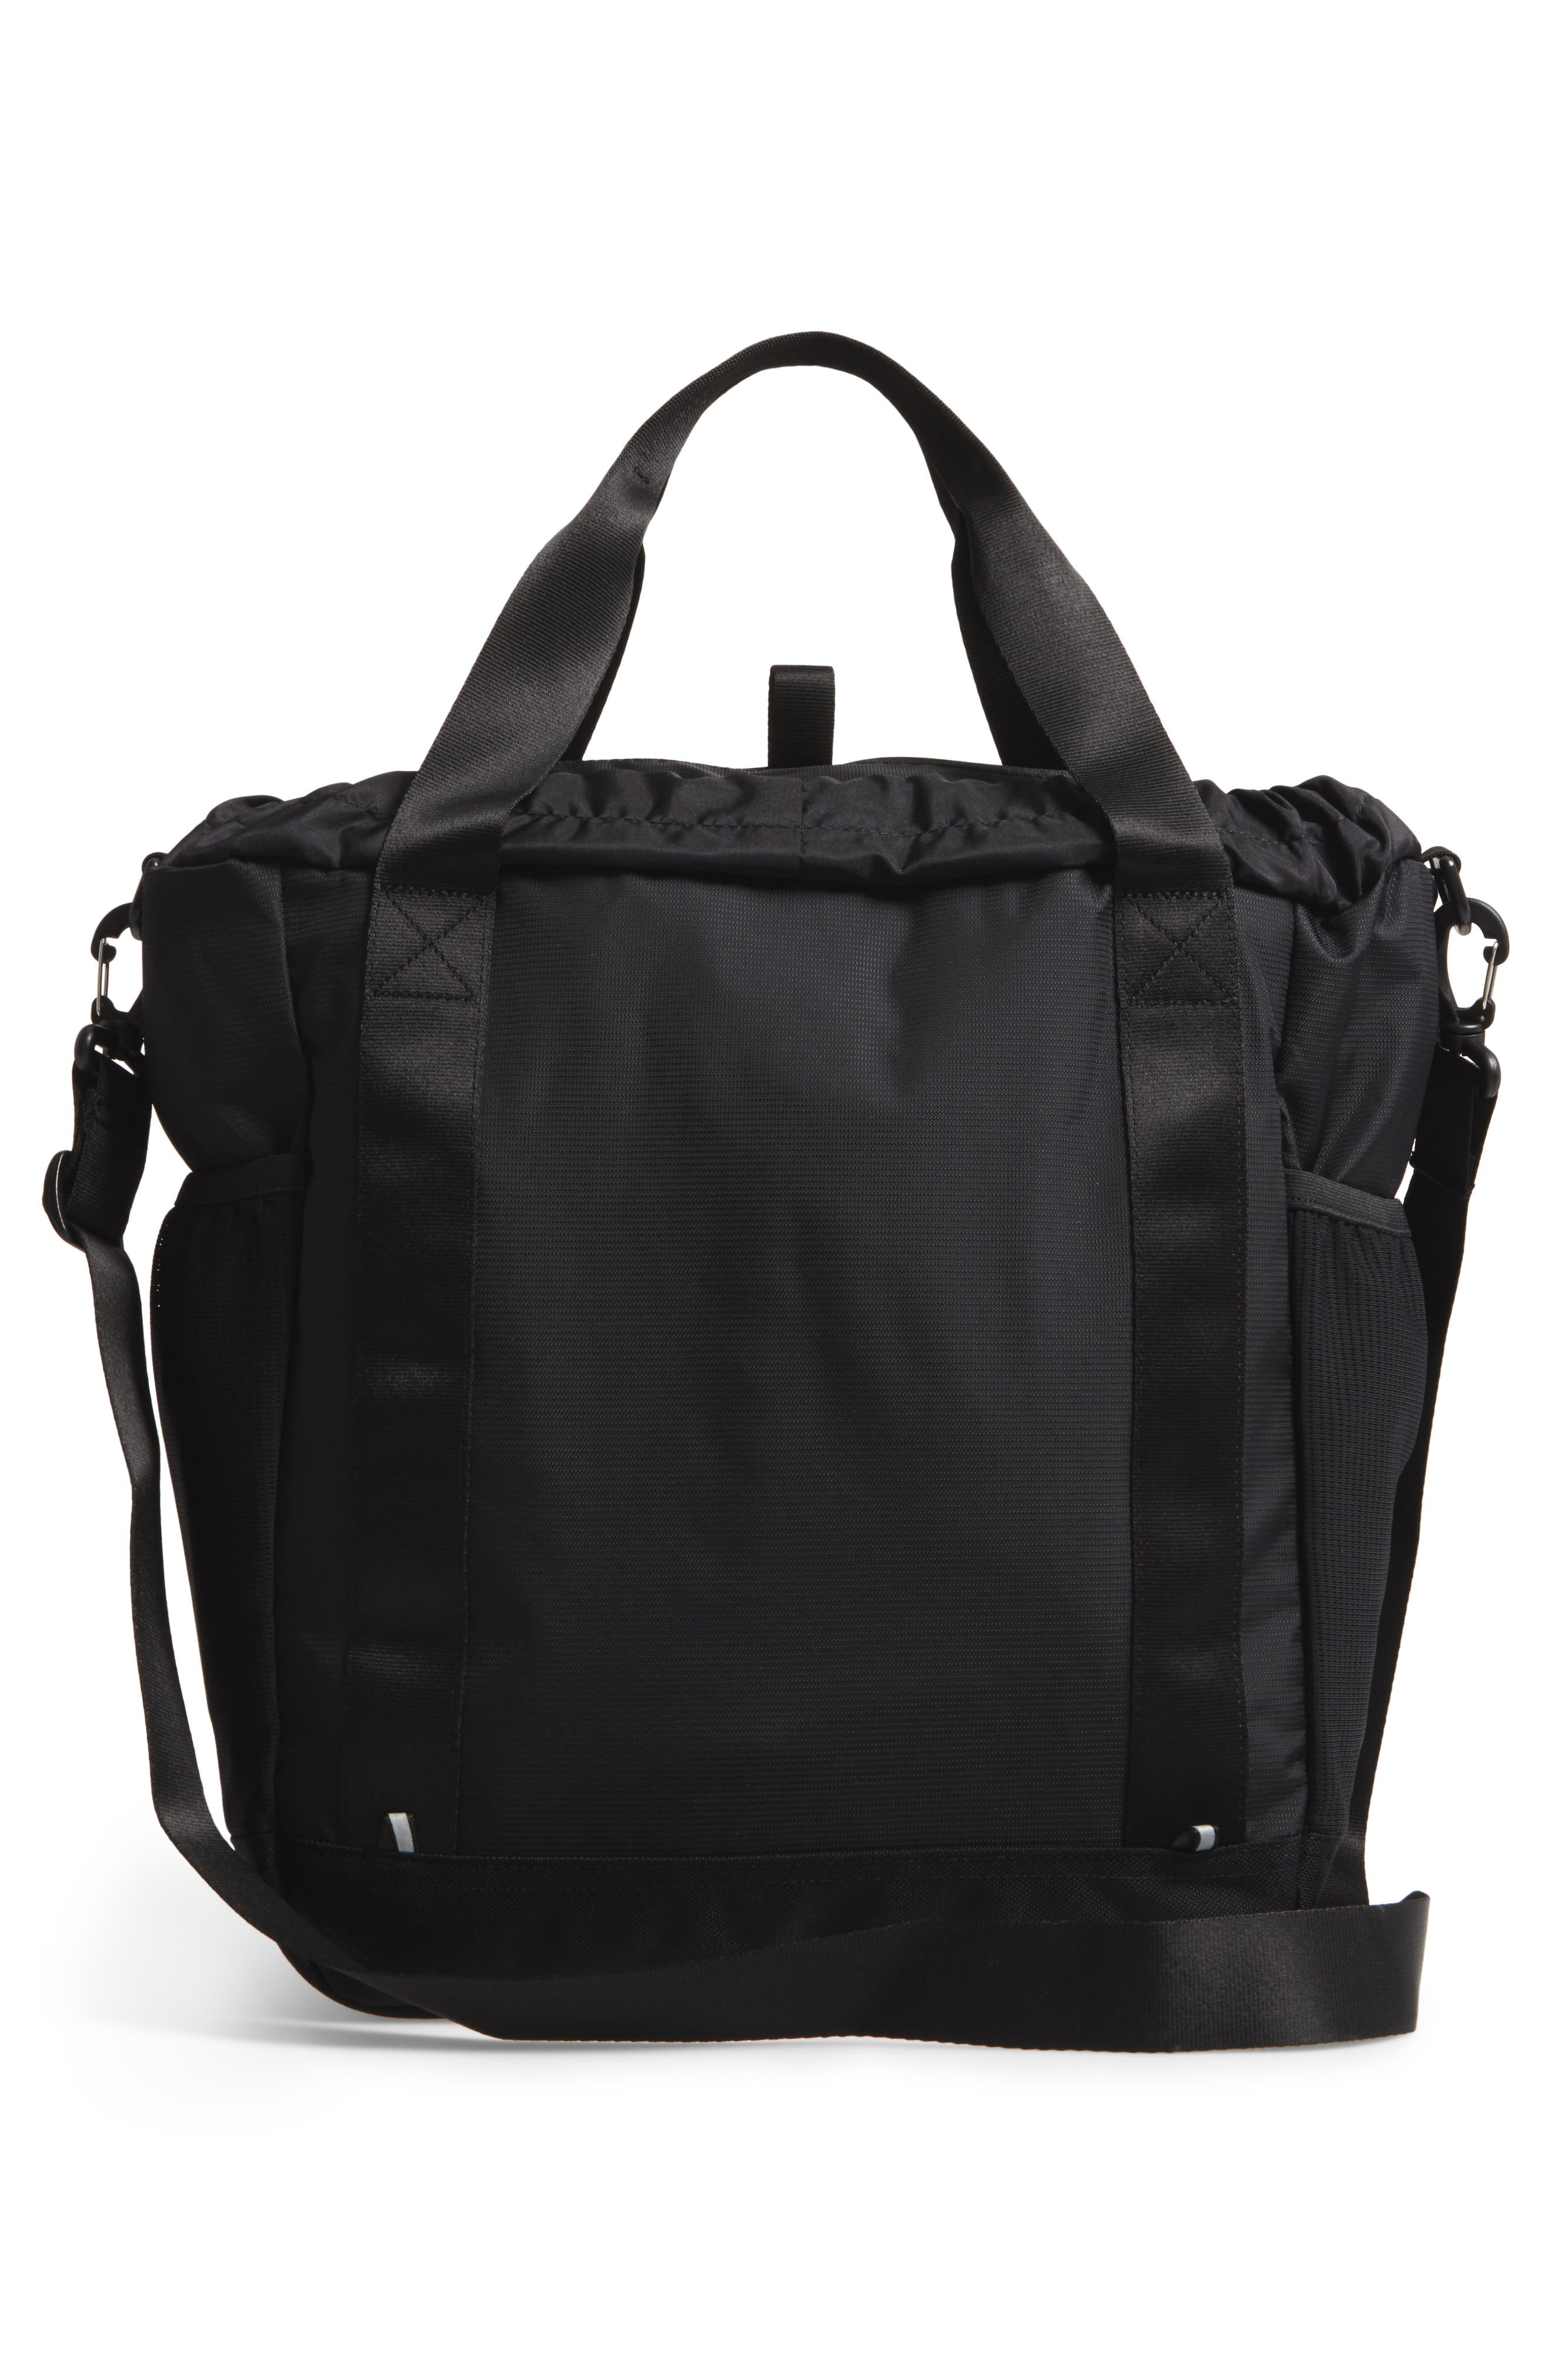 Barnes Trail Tote Bag,                             Alternate thumbnail 3, color,                             BLACK